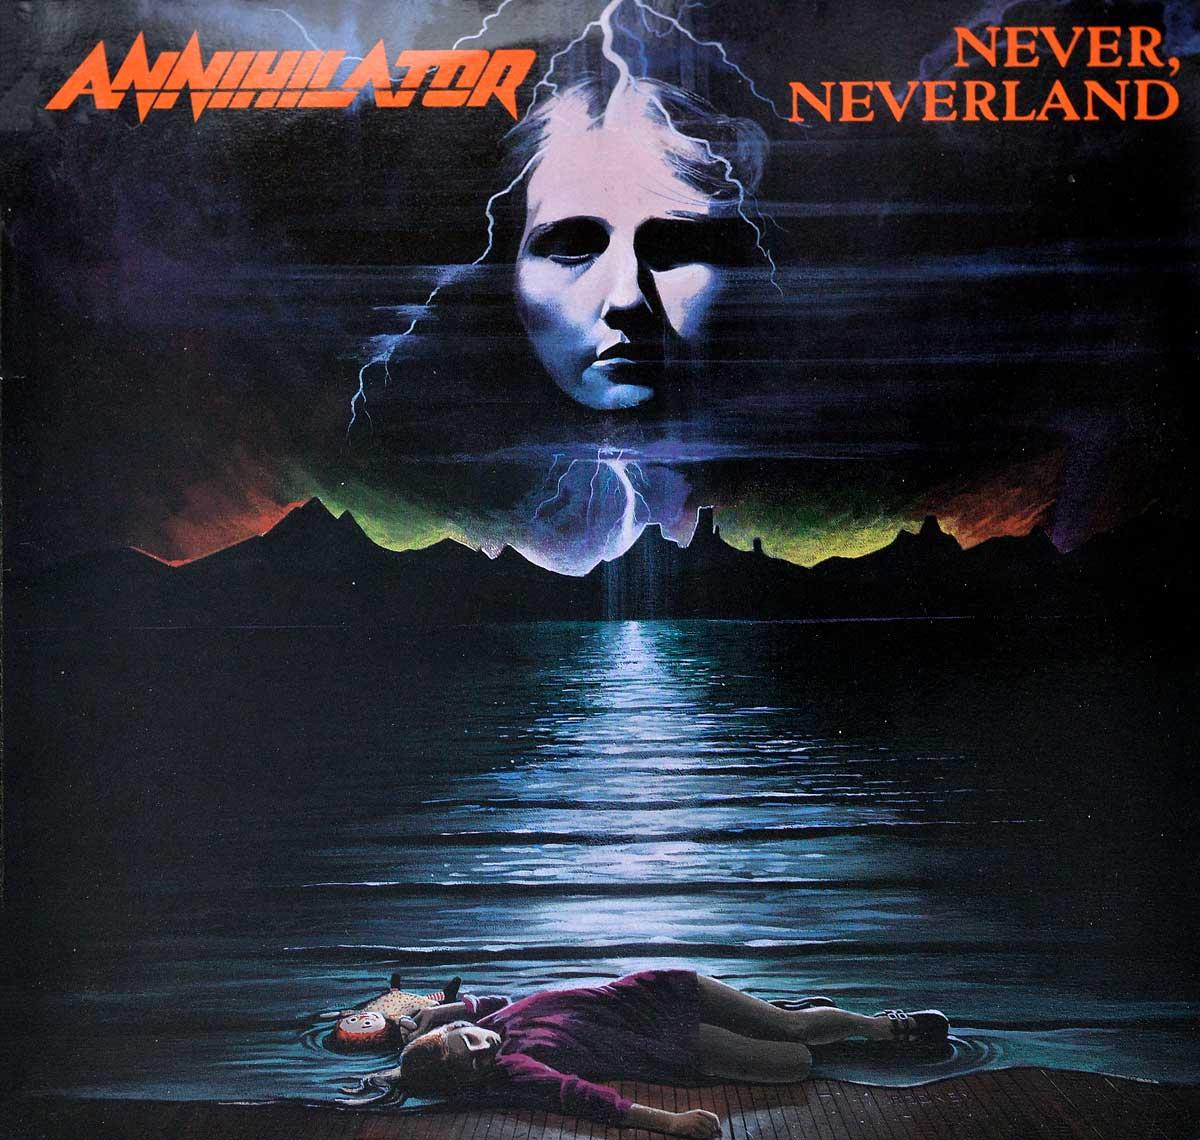 Large Album Front Cover Photo of ANNIHILATOR - Never, Neverland